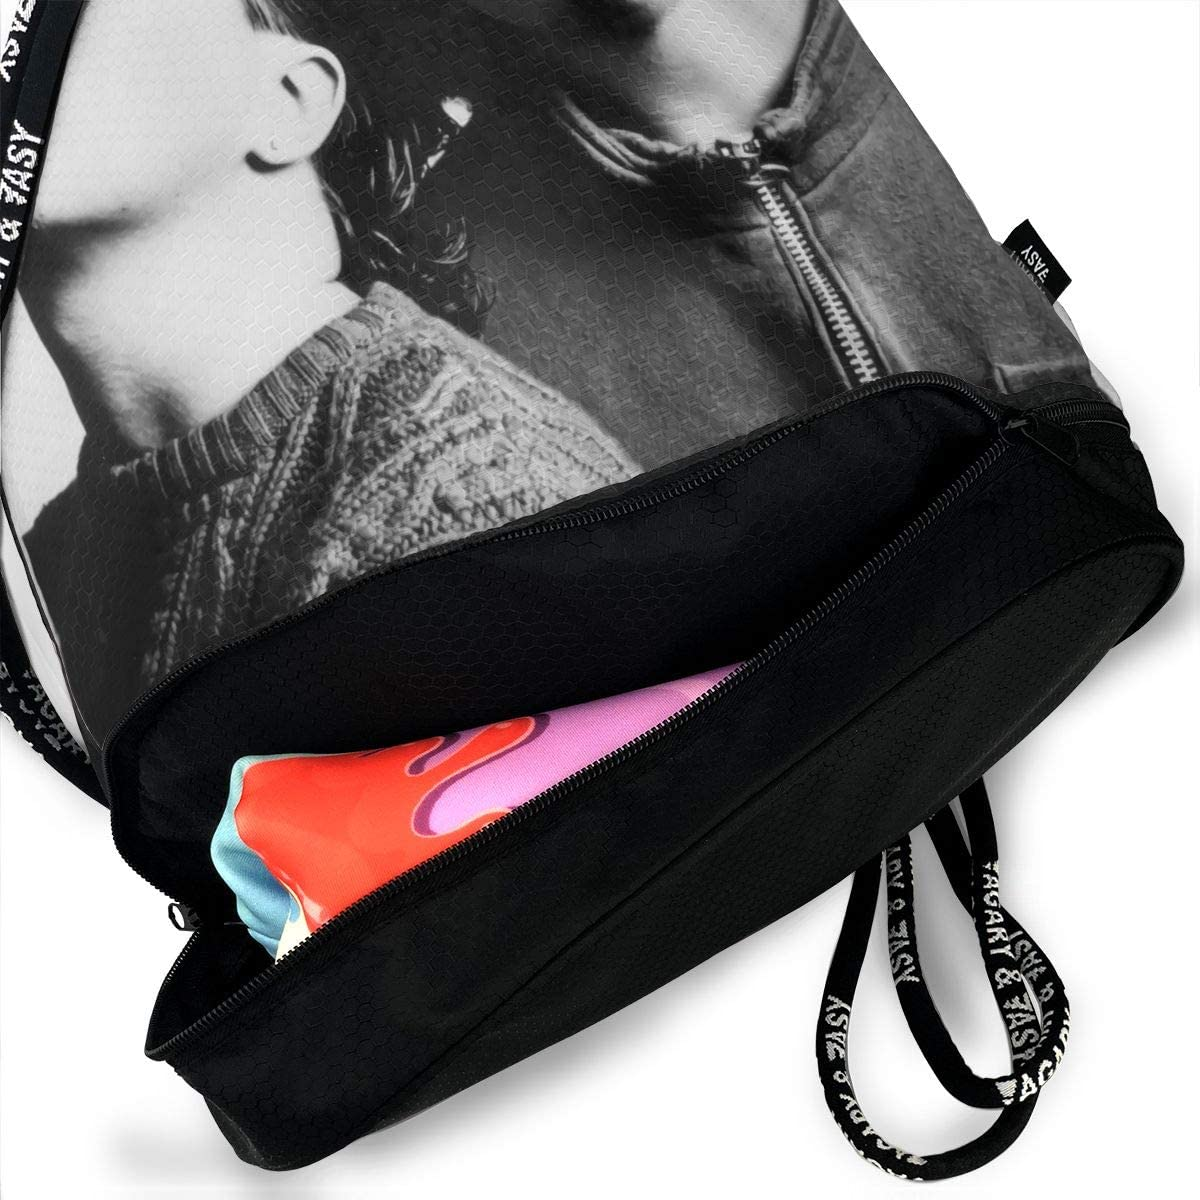 Thomas C Gaona Tears for Fears Original Shoulder Bag Drawstring Backpack Beam Mouth Single Pocket Outdoor Shopping Bag Backpack